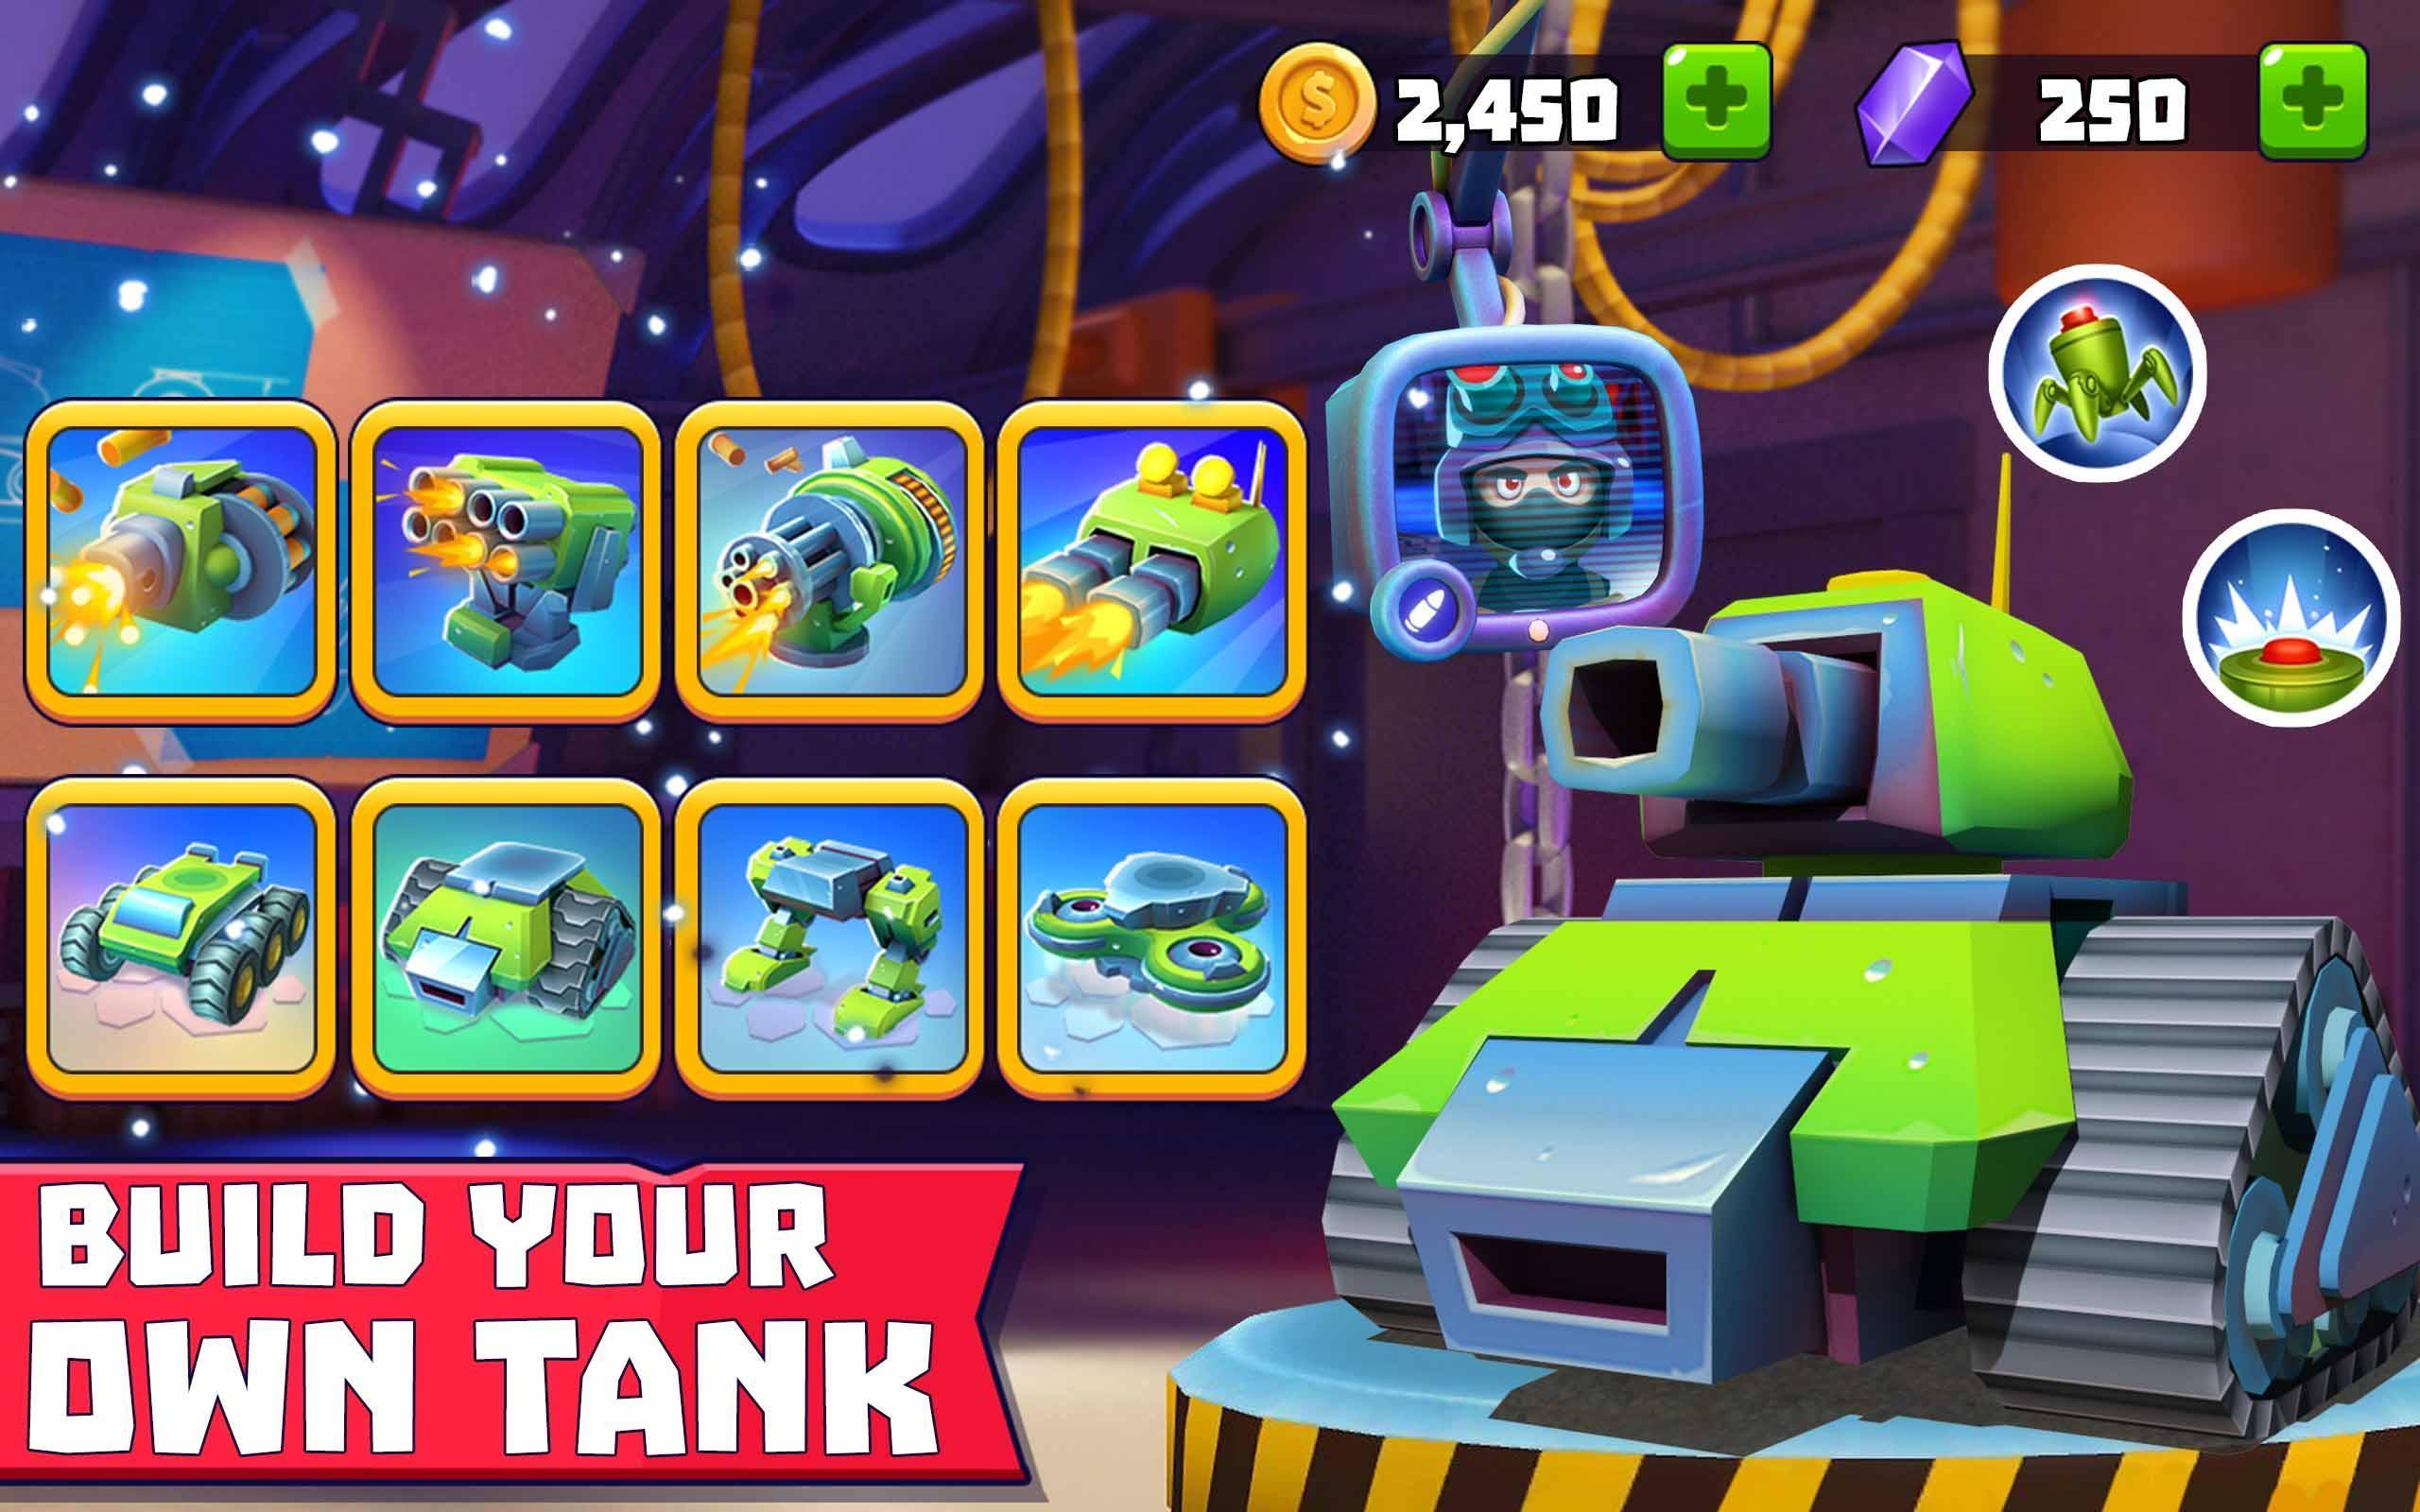 Tanks A Lot! - Realtime Multiplayer Battle Arena 2.56 Screenshot 10